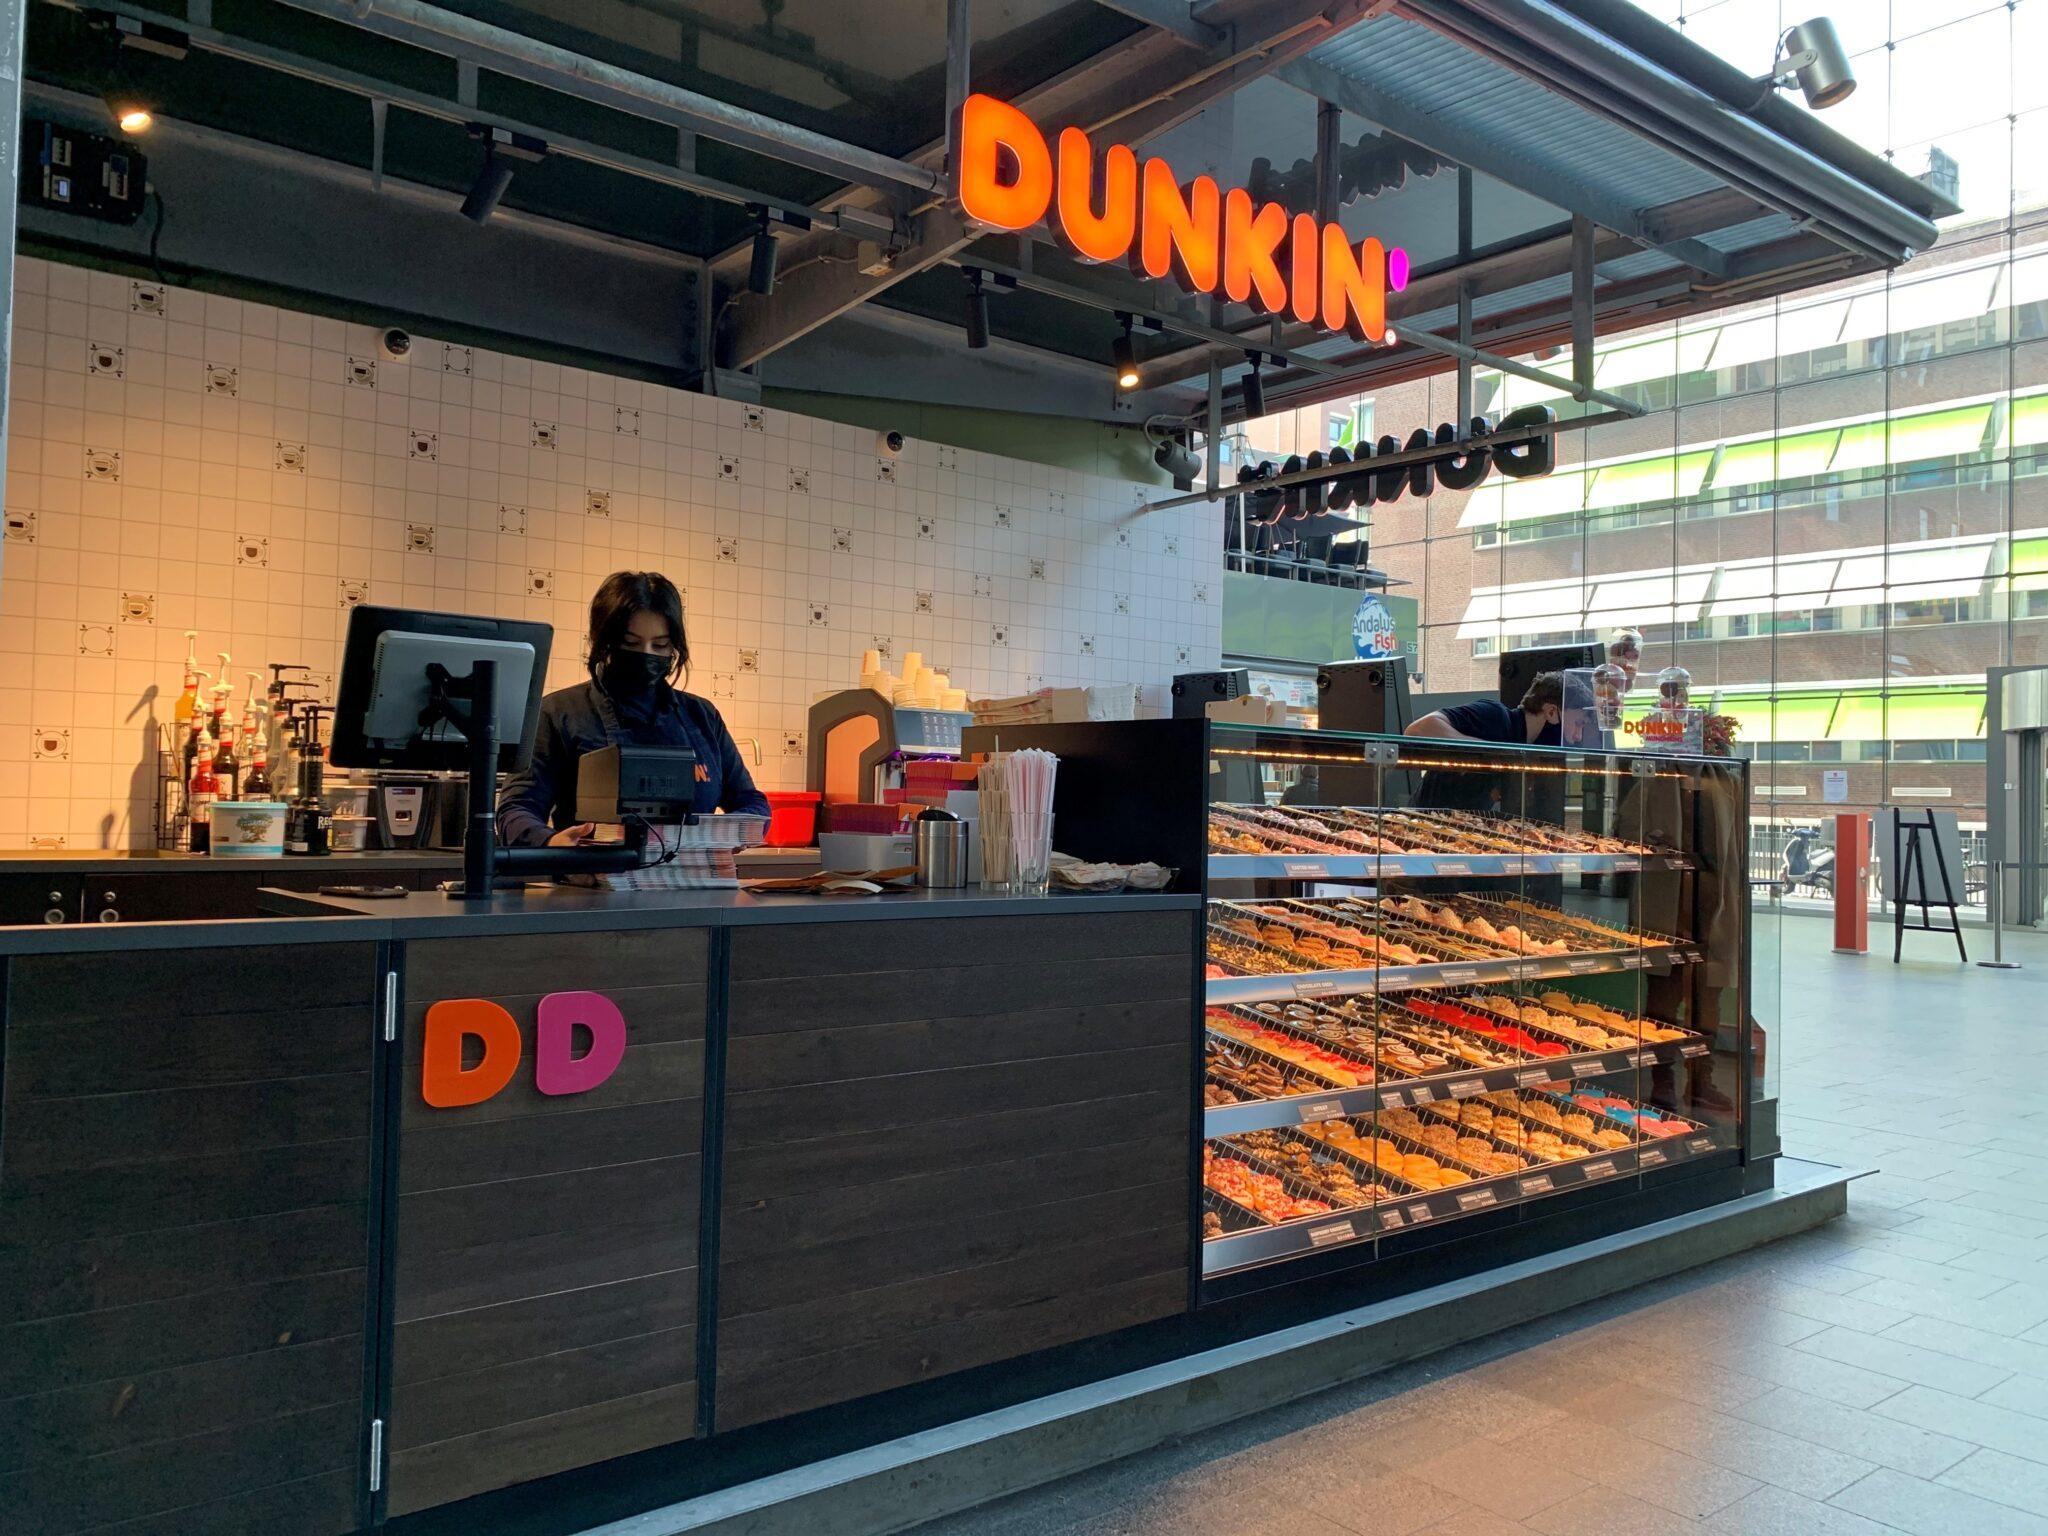 Dunkin' Donuts zijaanzicht Markthal